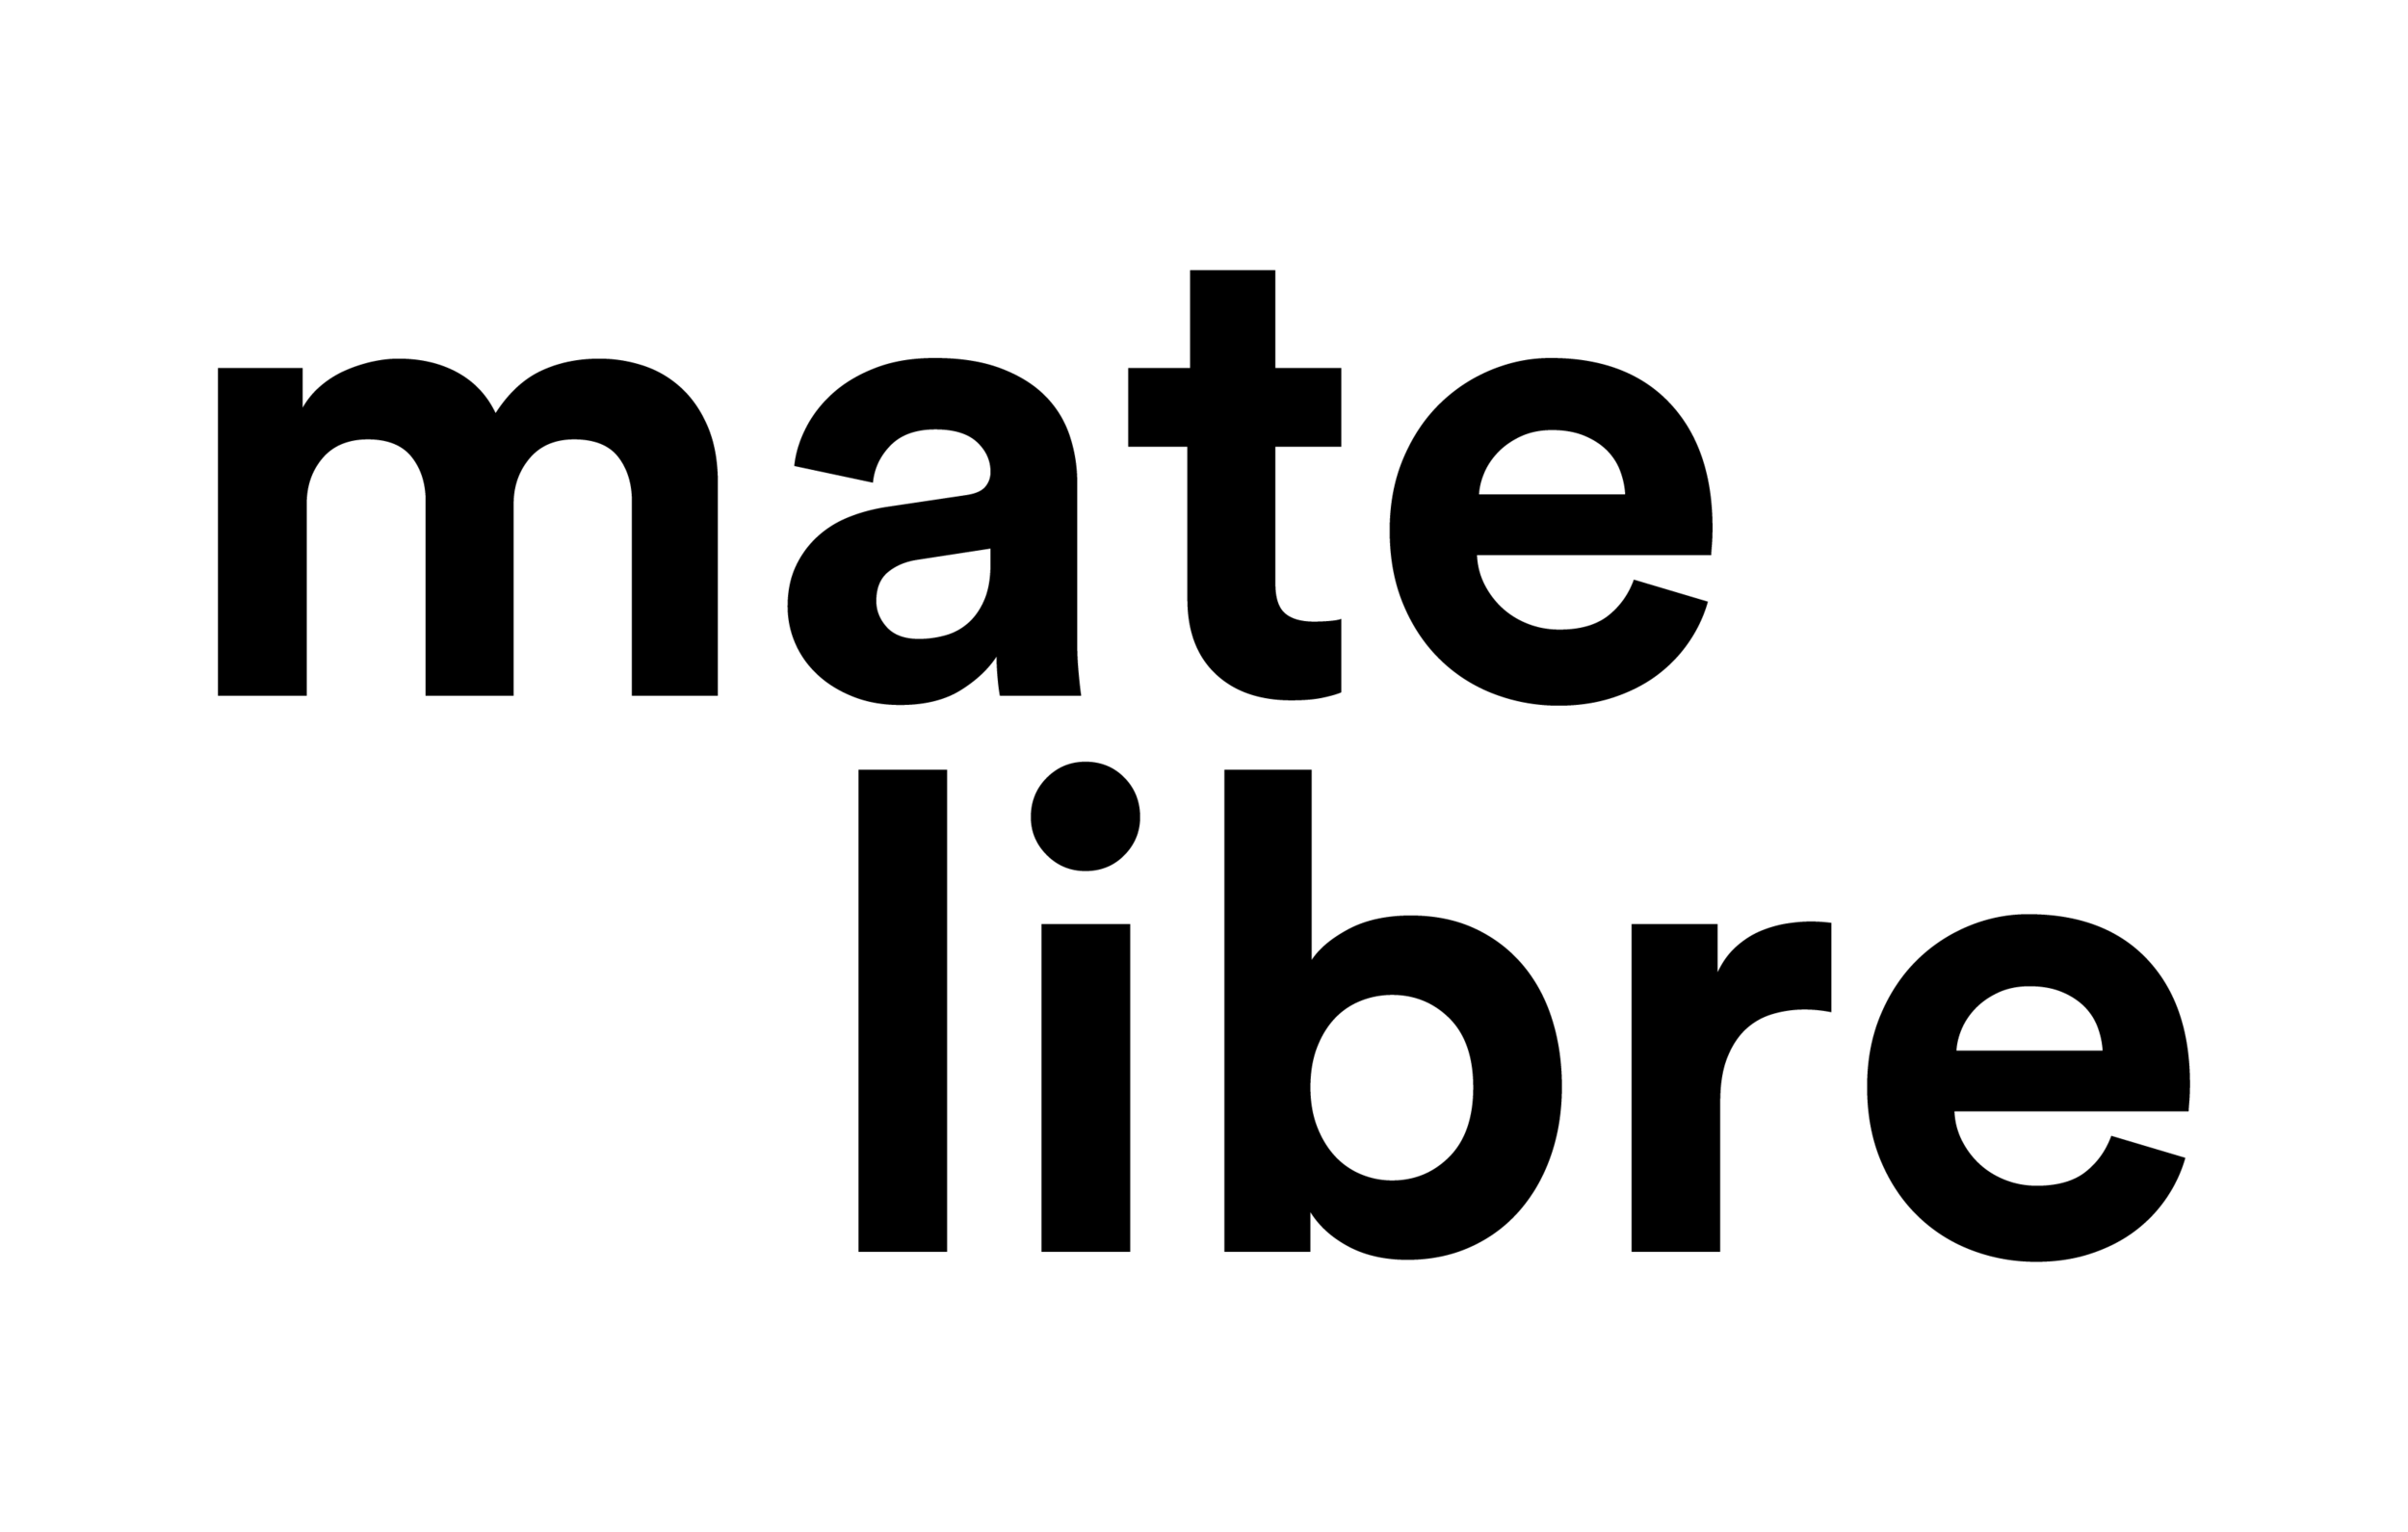 MateLibre-Logo-Black-01.png